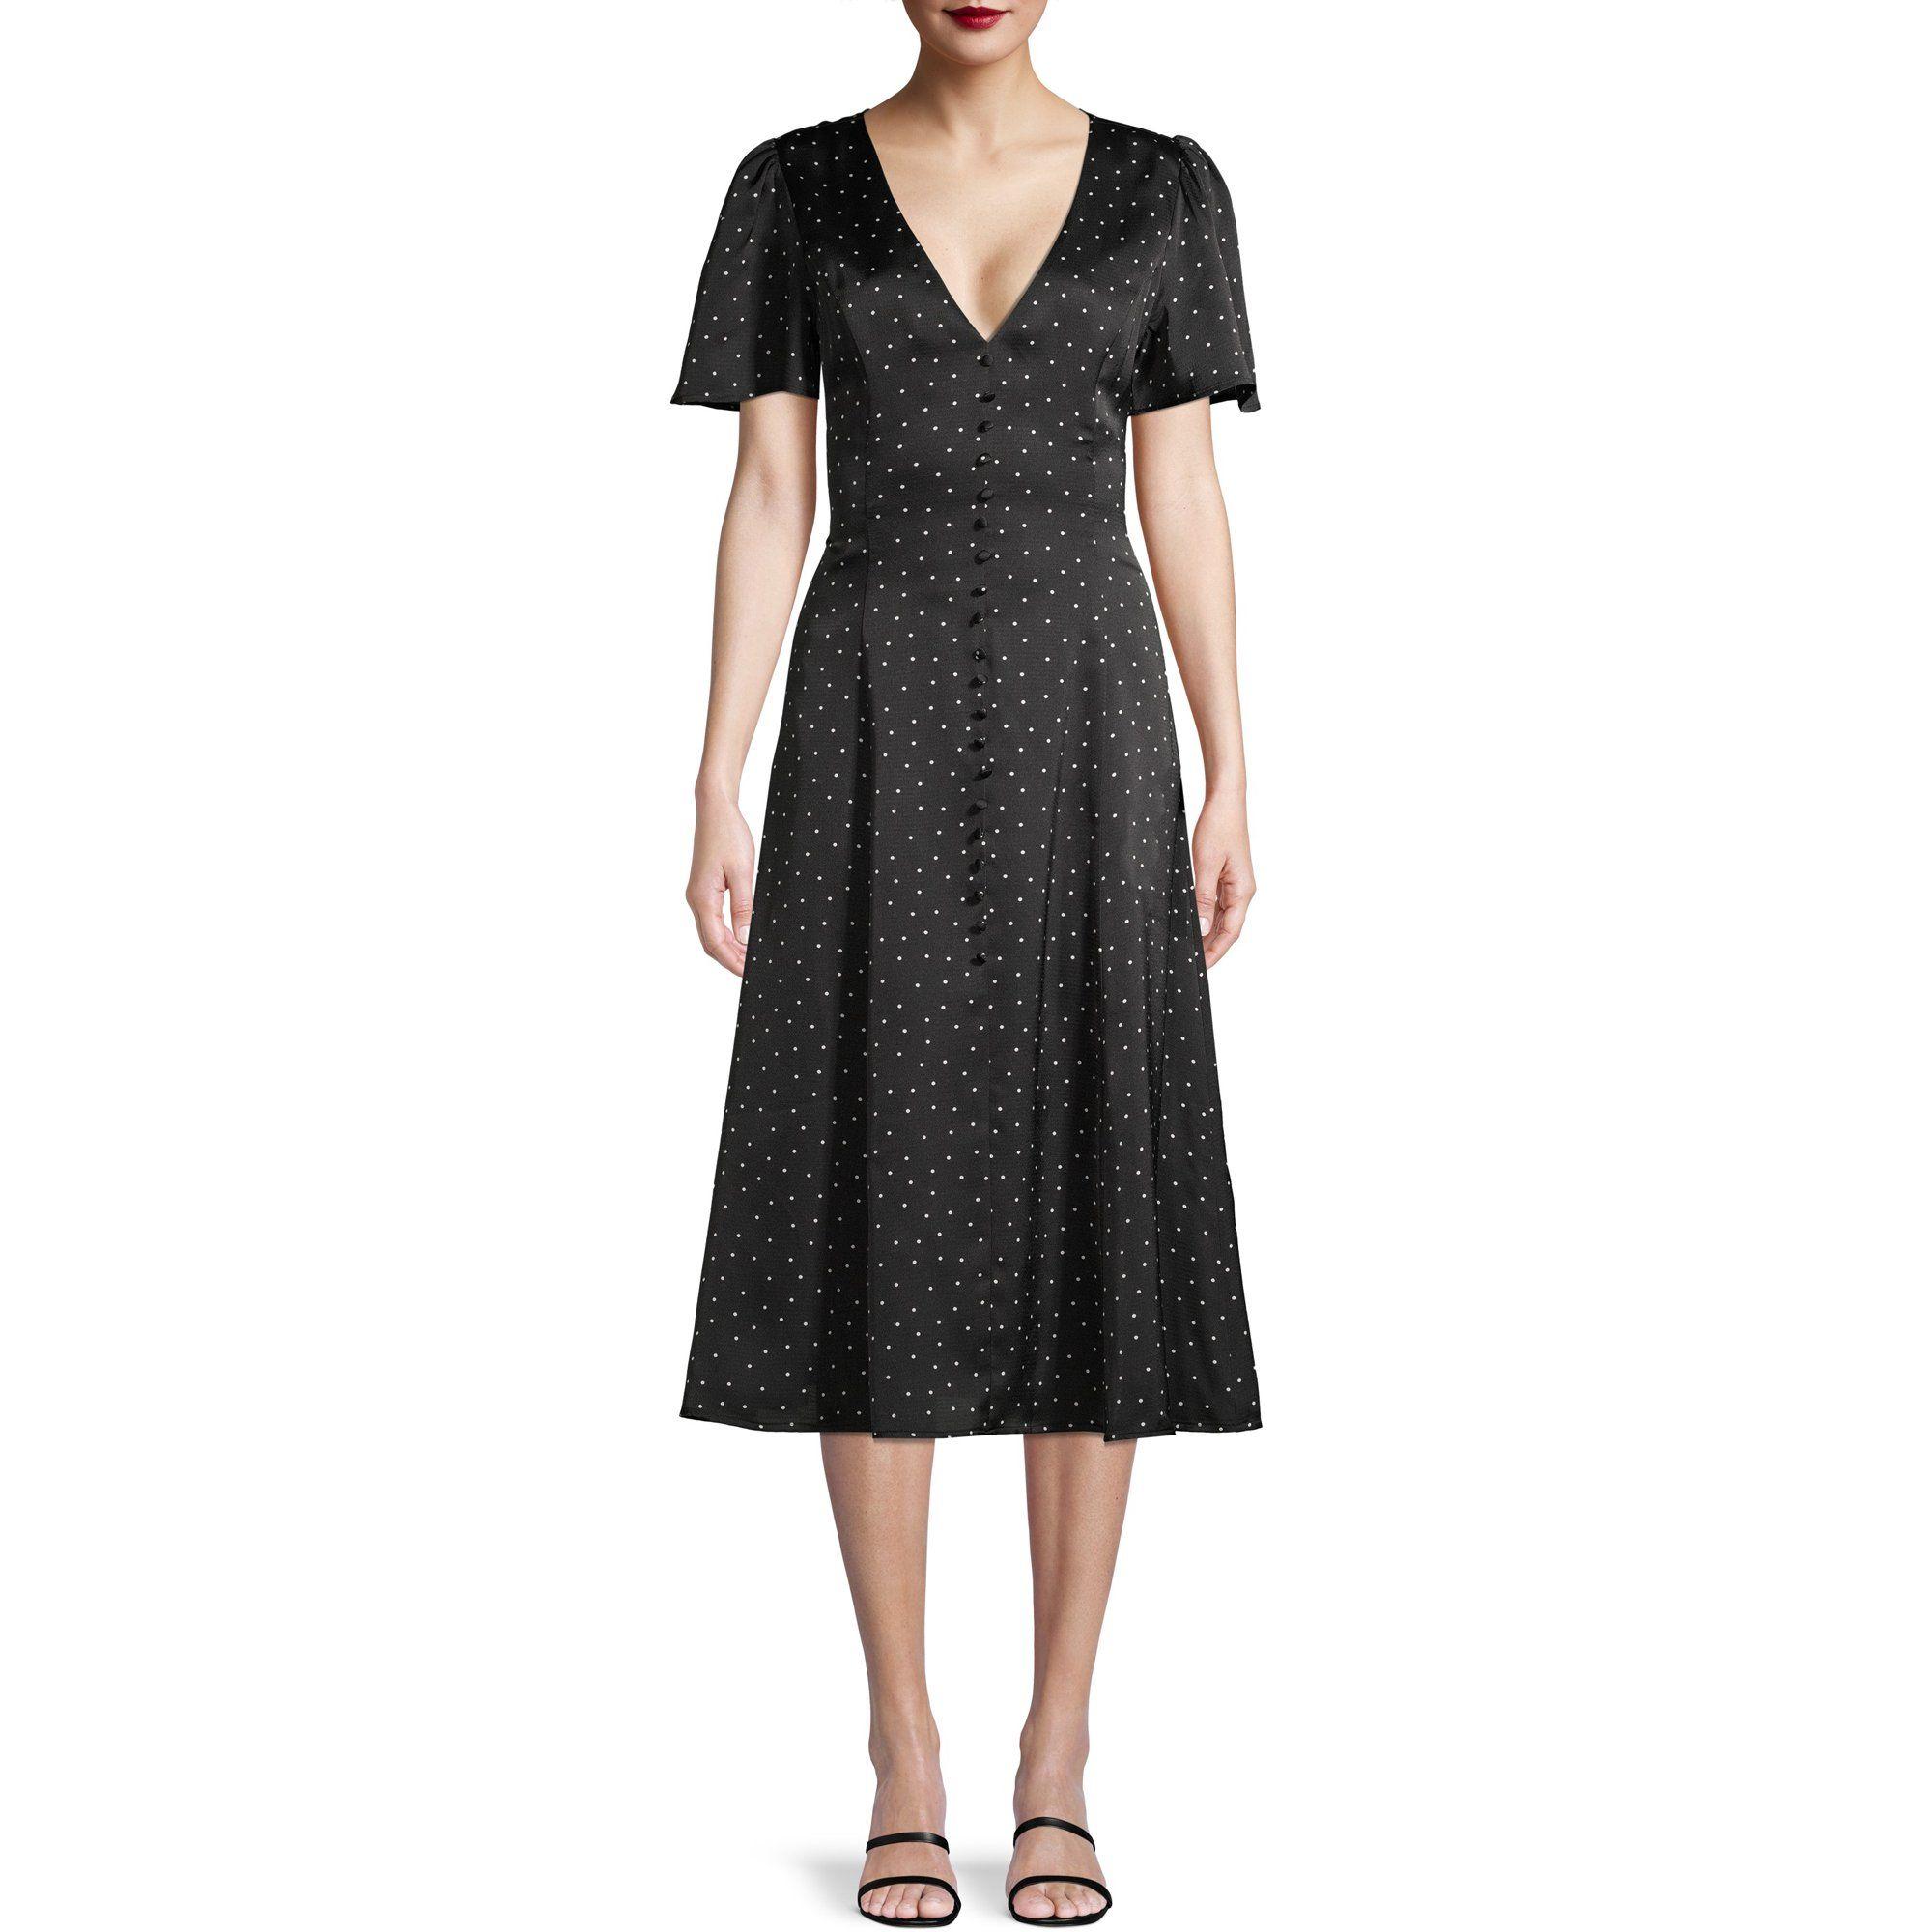 Prospect The Label Prospect The Label Women S Button Front Midi Dress Walmart Com Dresses Midi Dress Short Sleeve Dresses [ 2000 x 2000 Pixel ]